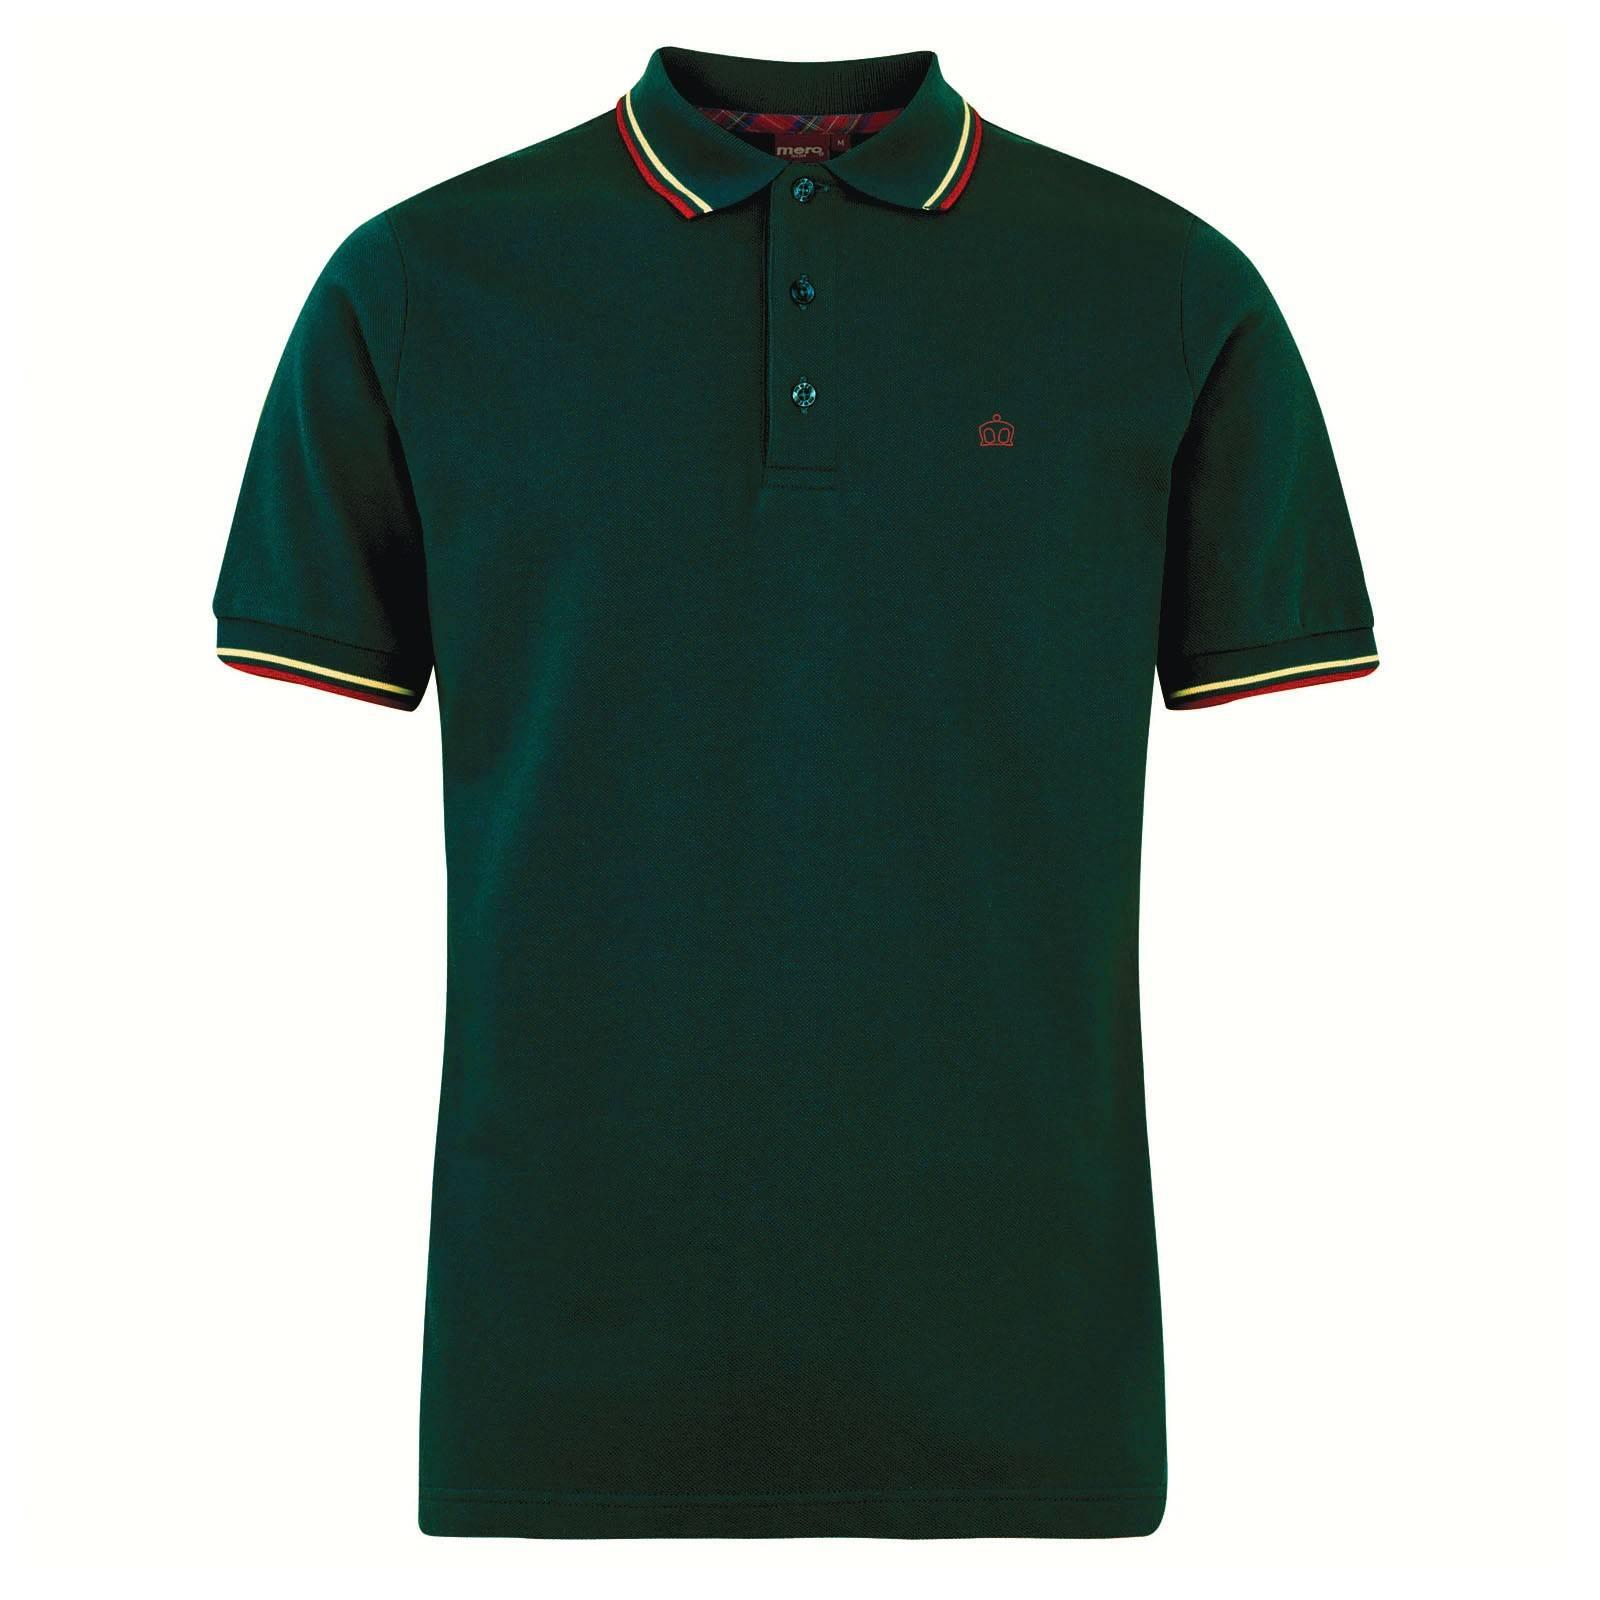 Рубашка Поло CardПоло под заказ<br><br><br>Артикул: 1906203<br>Материал: 100% хлопок<br>Цвет: темно-зеленый<br>Пол: Мужской